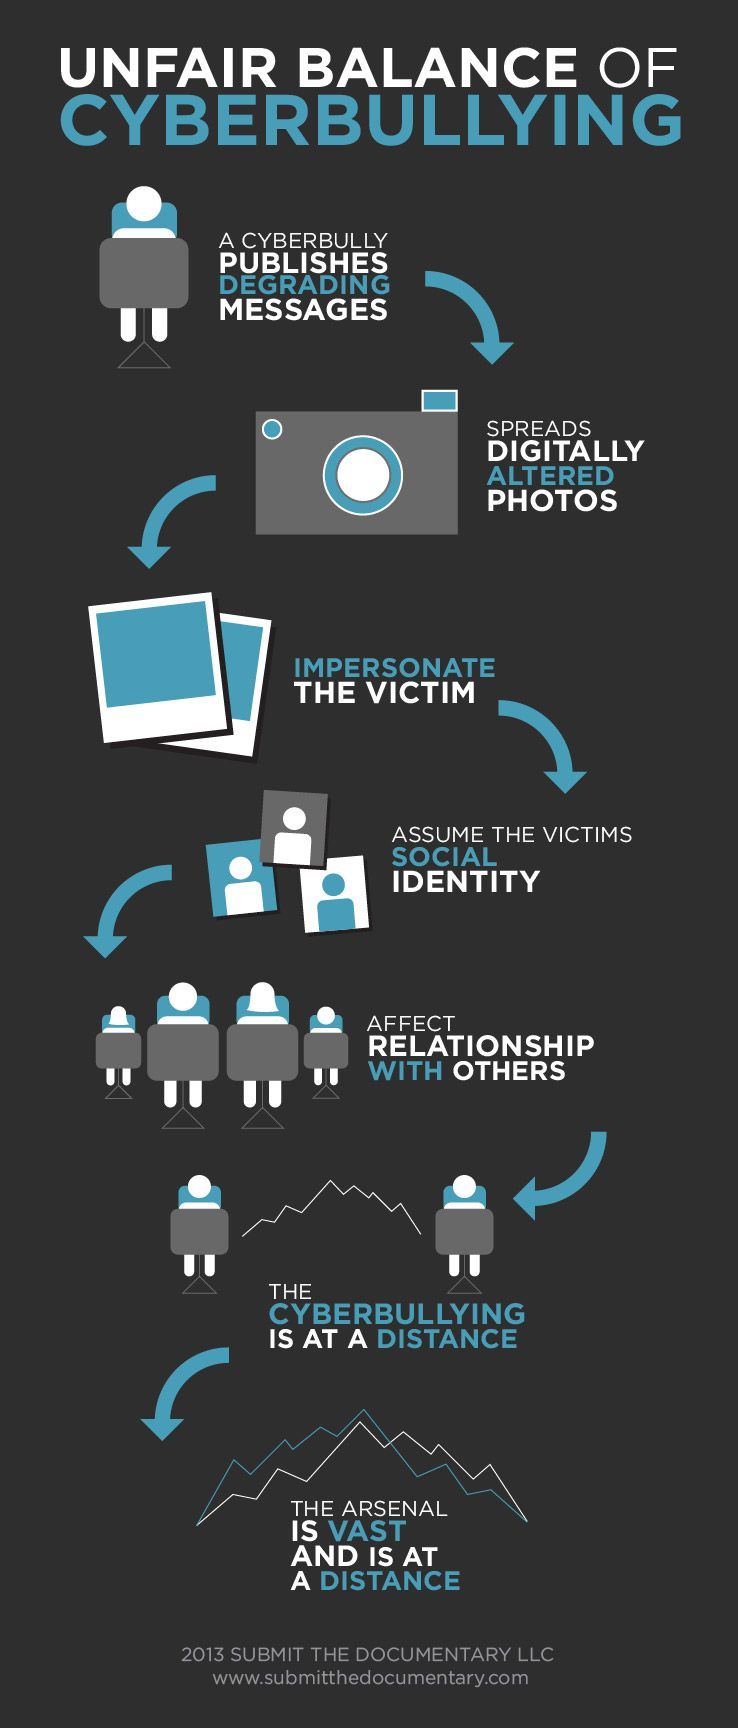 Cyberbullying Power Imbalance